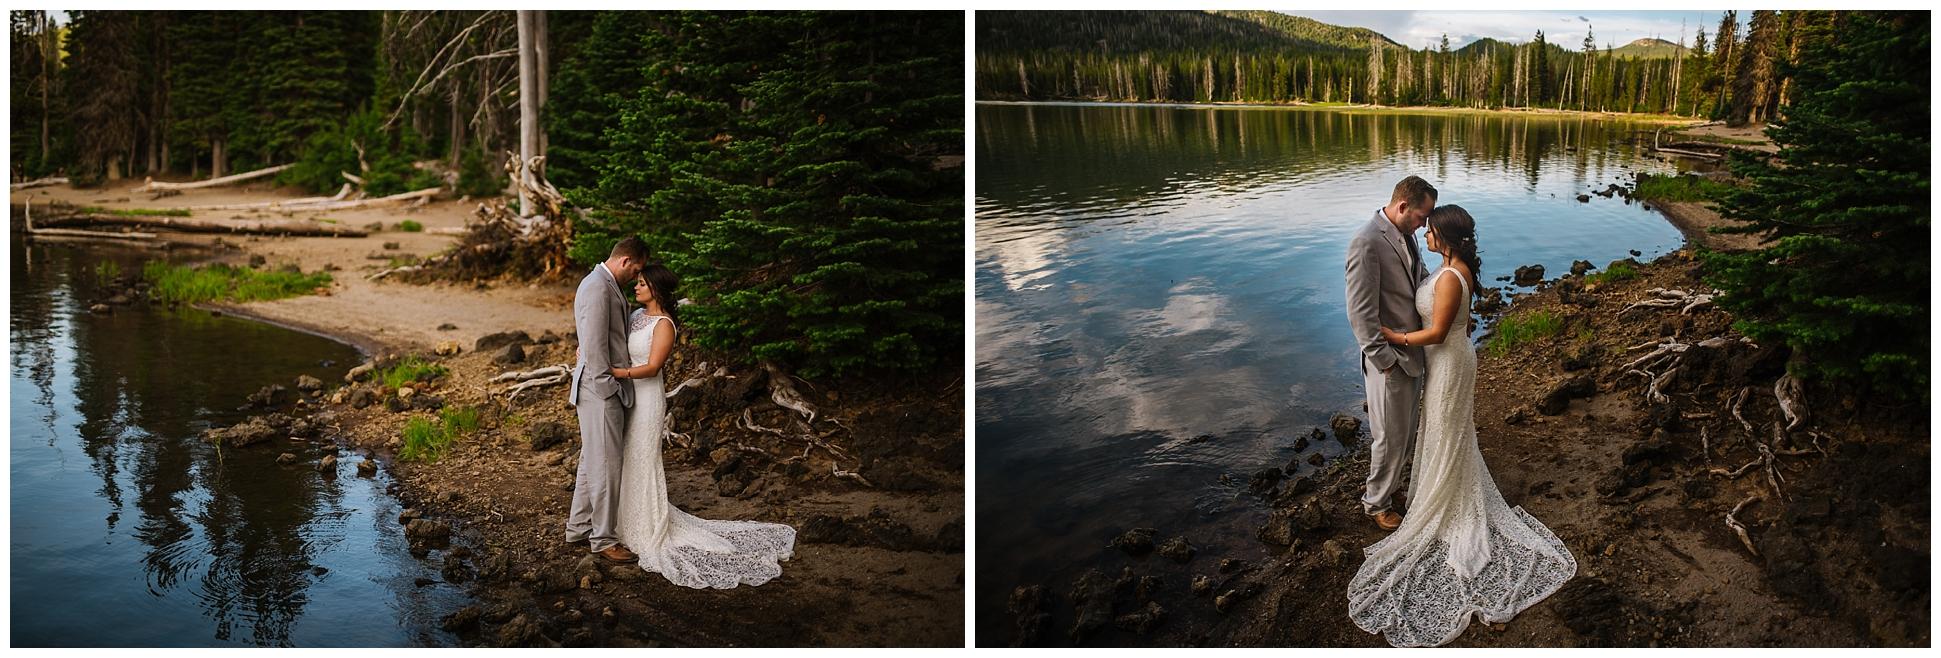 Ashlee-hamon-photography-year-in-review-2016-travel-wanderlust-vsco-adventure-wedding_0054.jpg